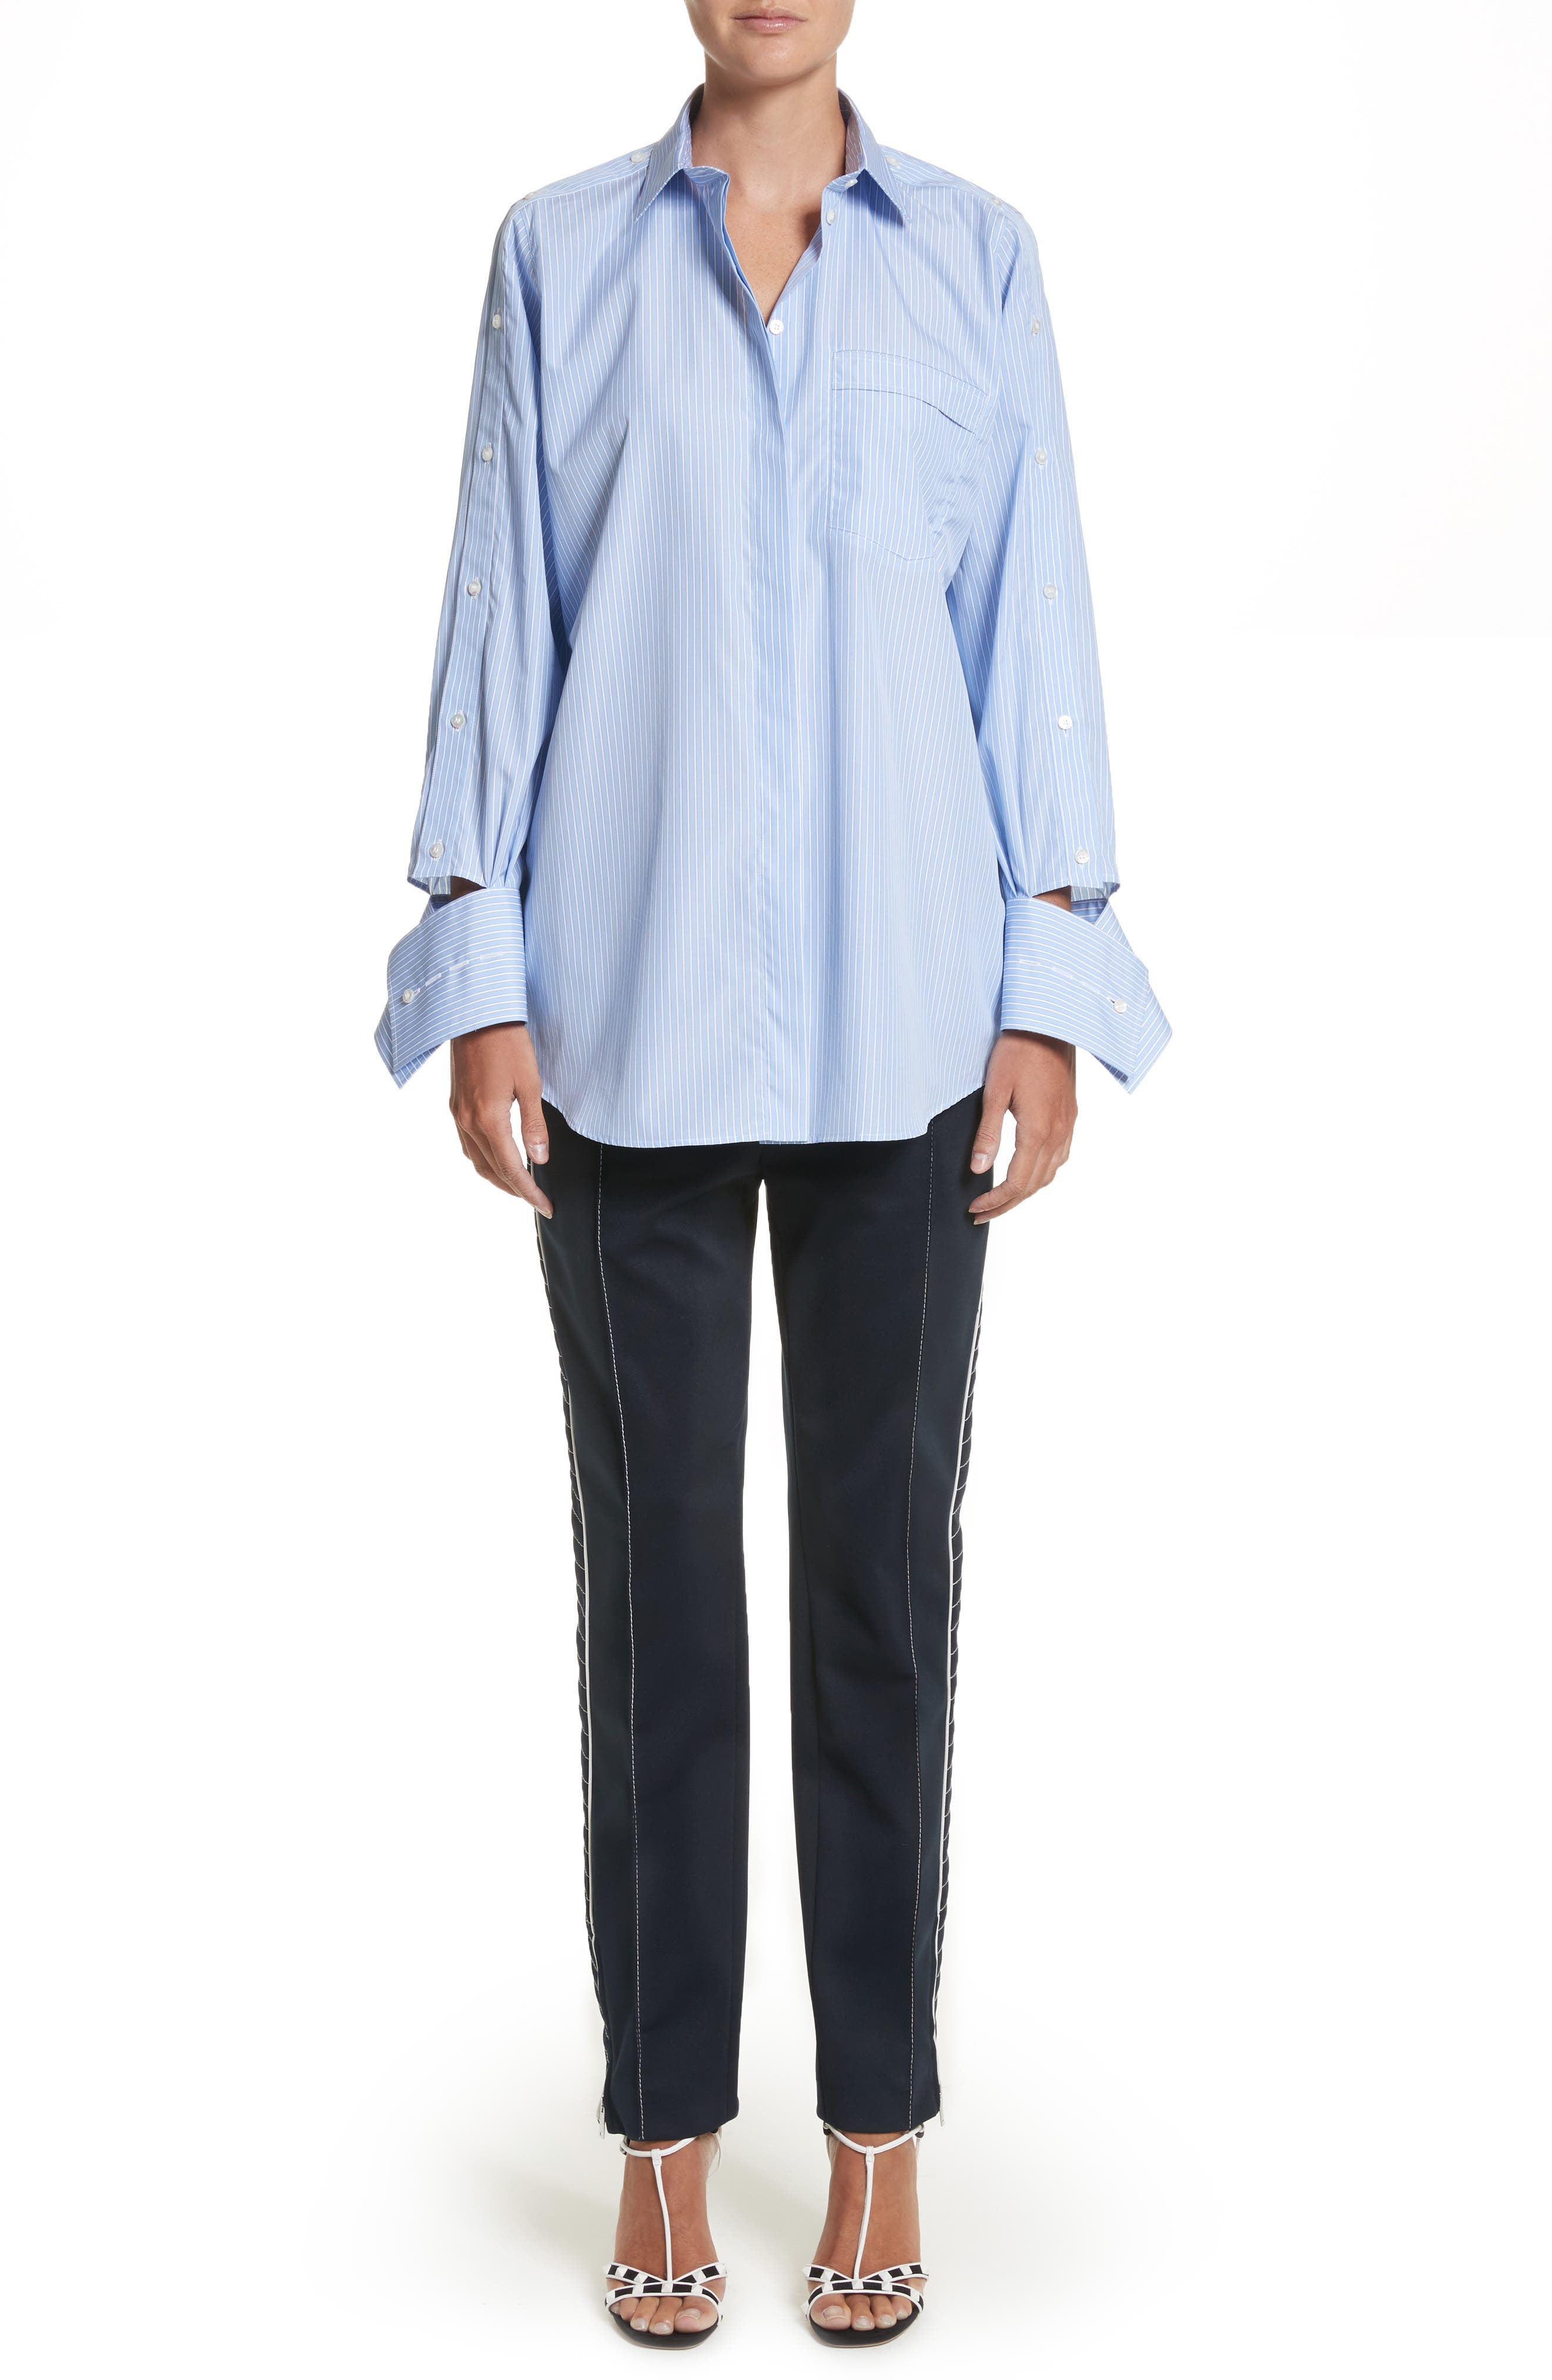 Cutaway Sleeve Cotton Poplin Shirt,                             Alternate thumbnail 8, color,                             Blue / White